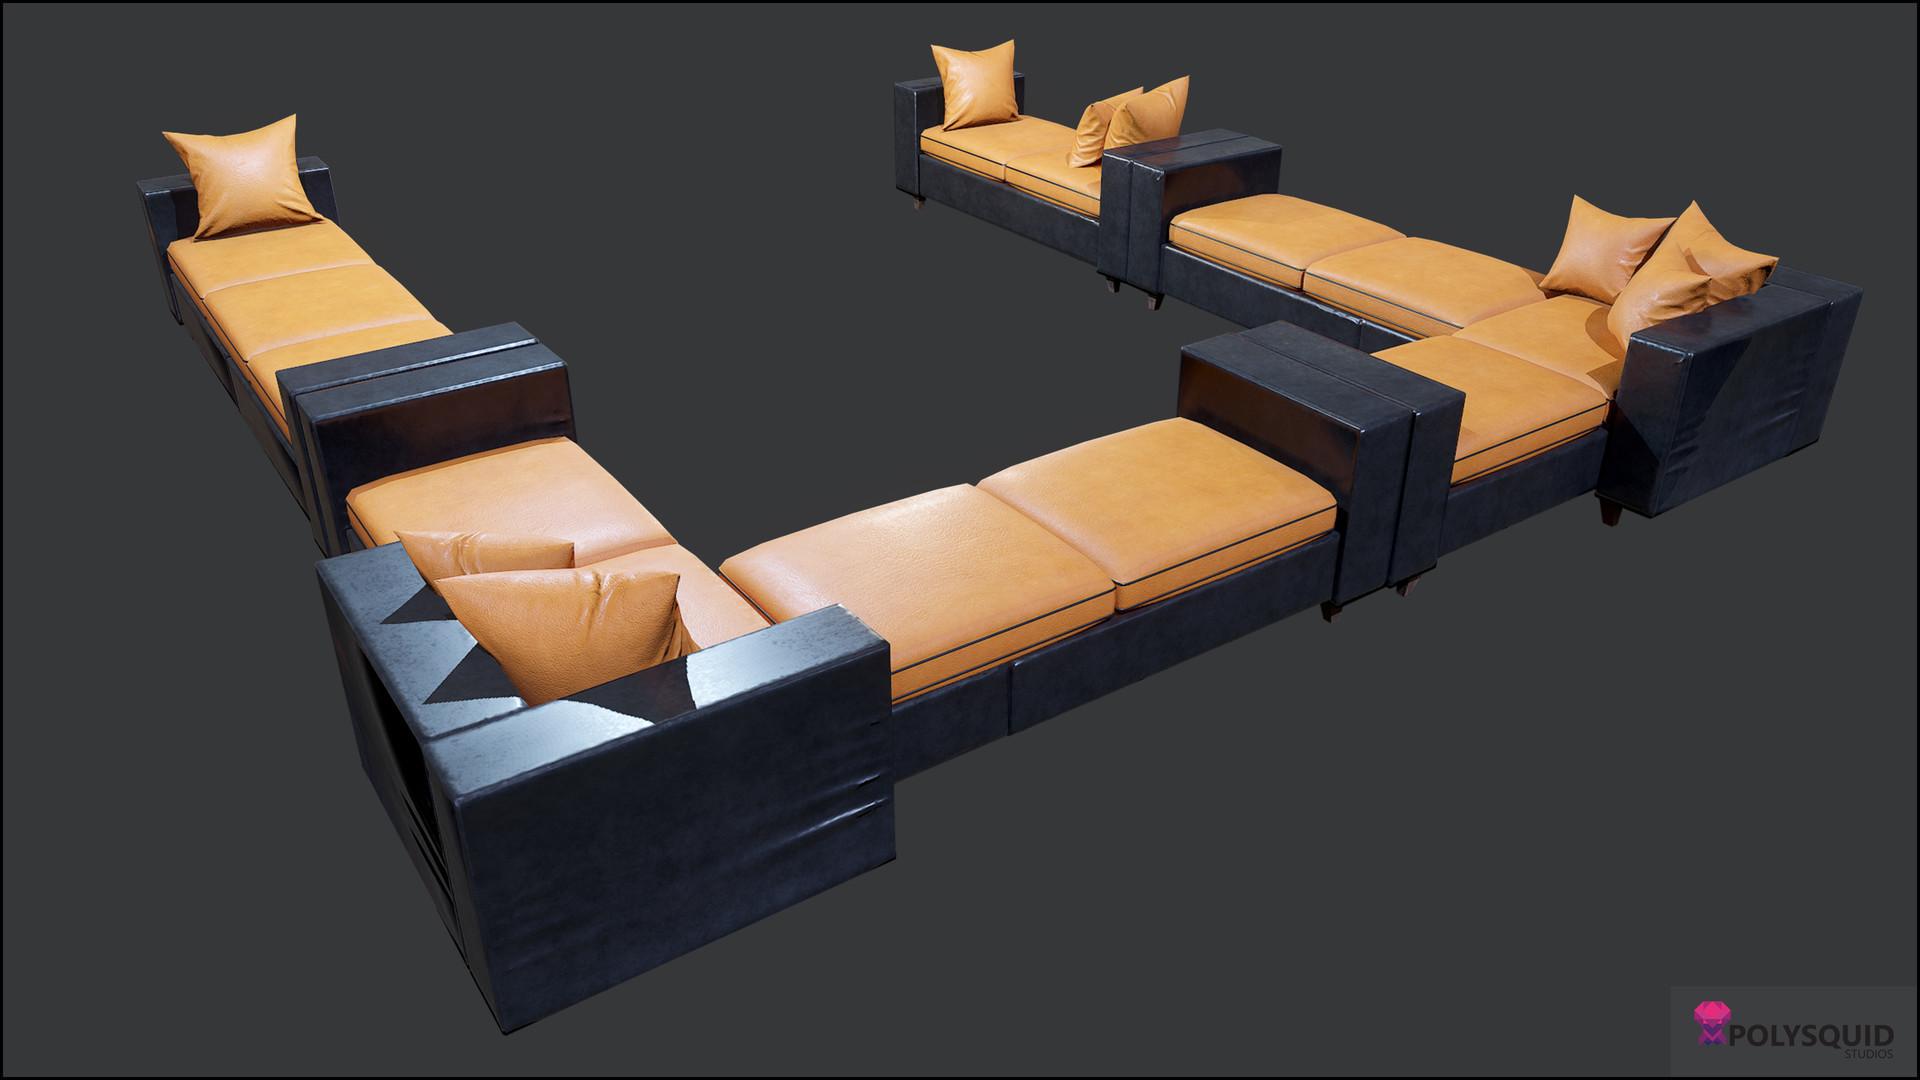 Poly squid florin bisca modular sofa03